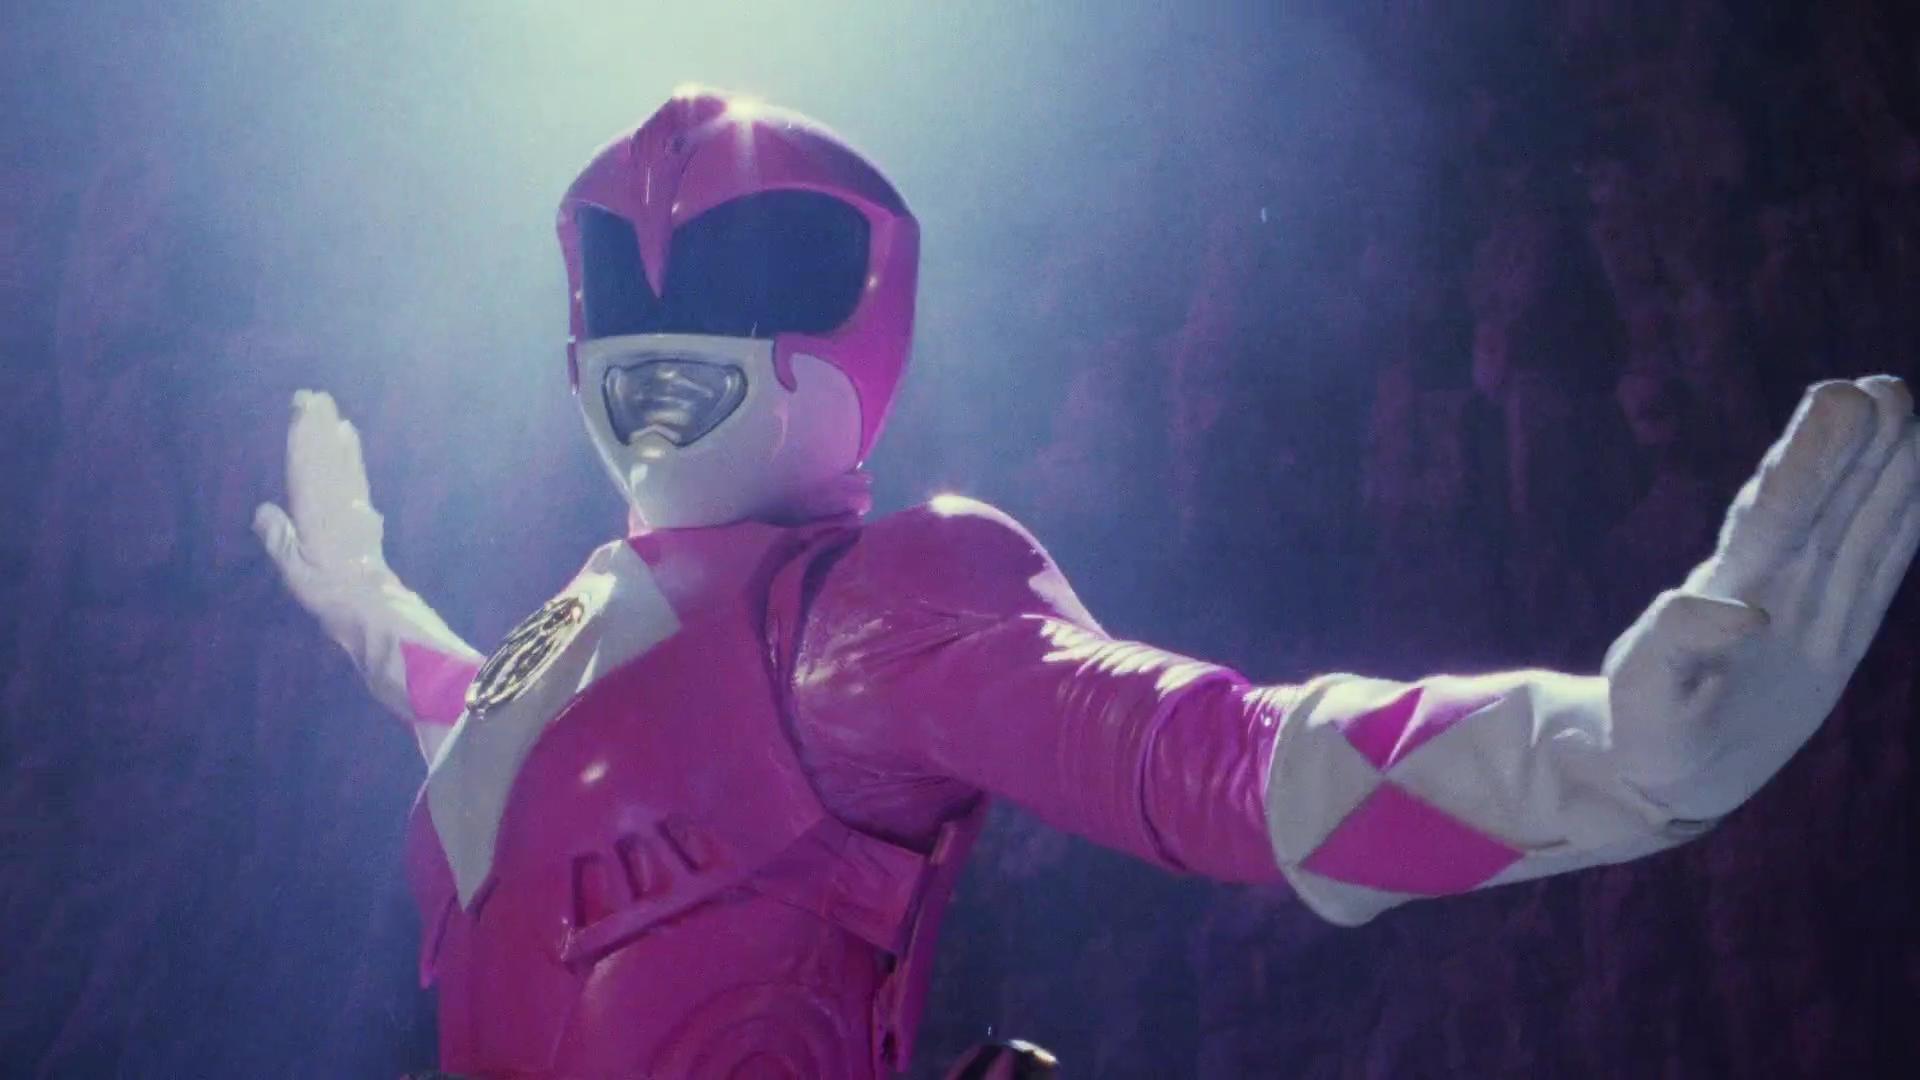 mighty morphin power rangers the movie rangerwiki autos post